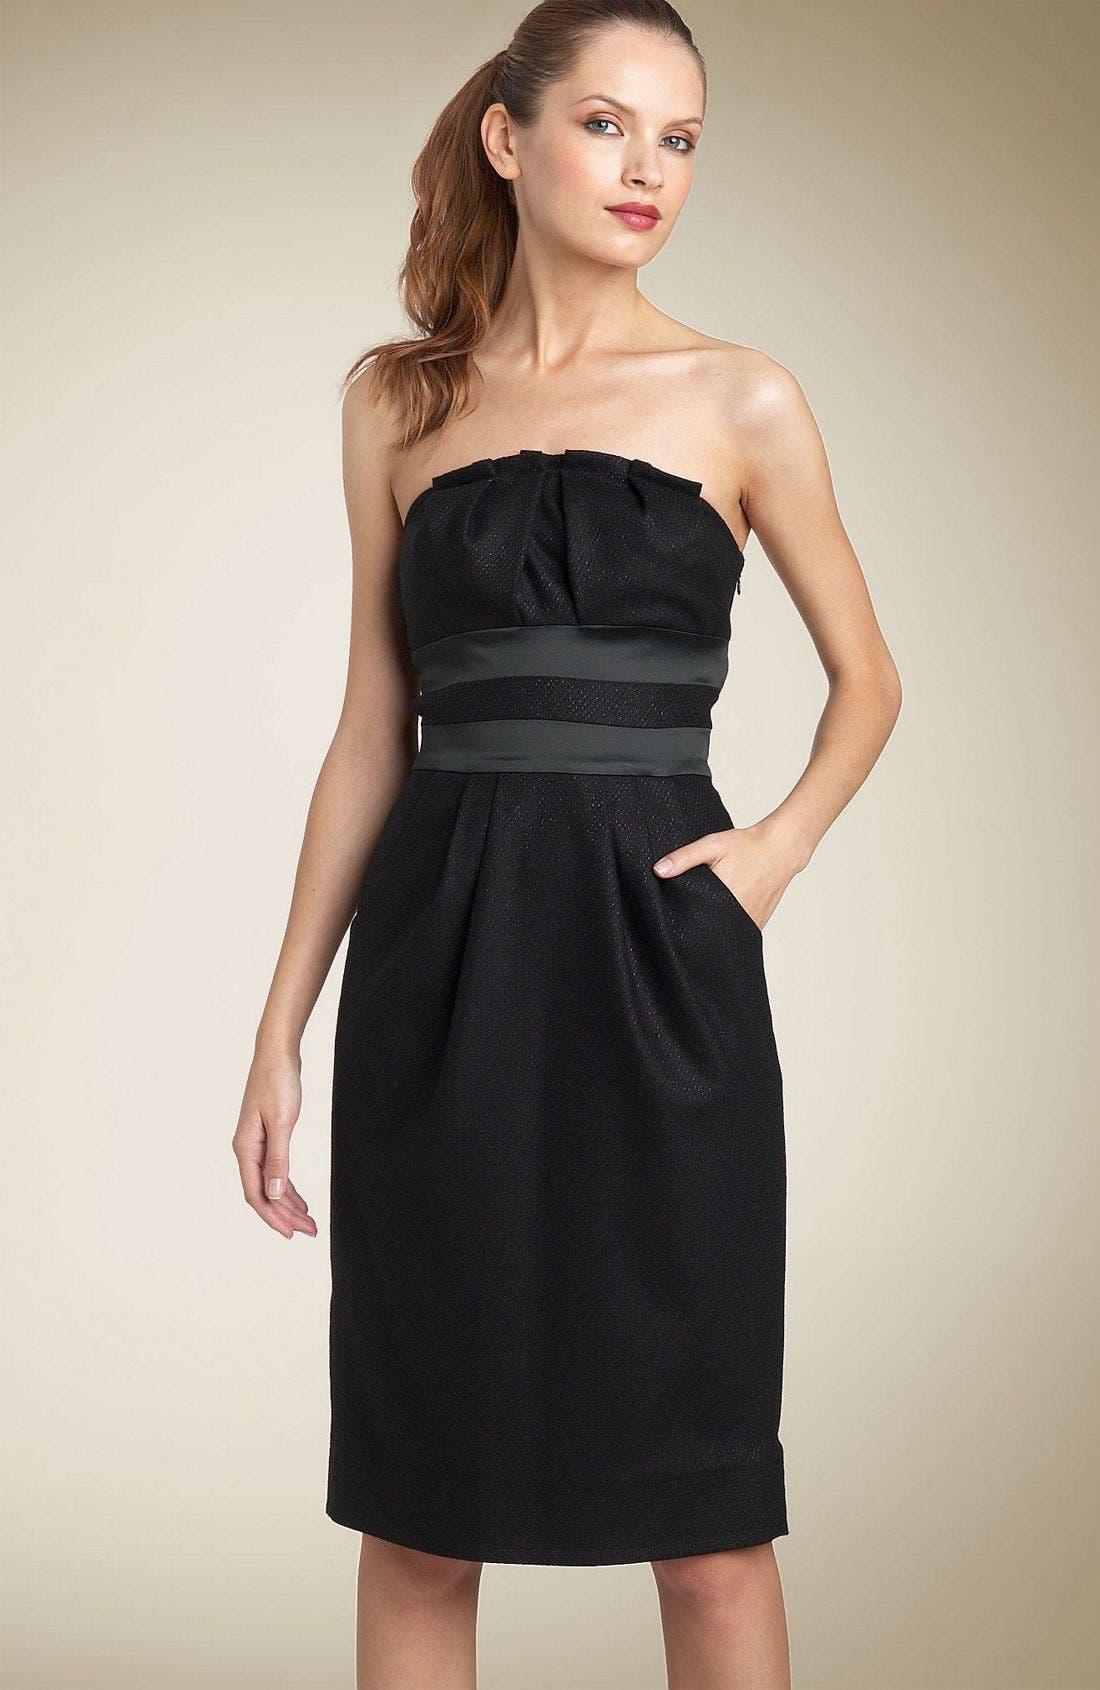 Alternate Image 1 Selected - Diane von Furstenberg 'Filomena' Dress